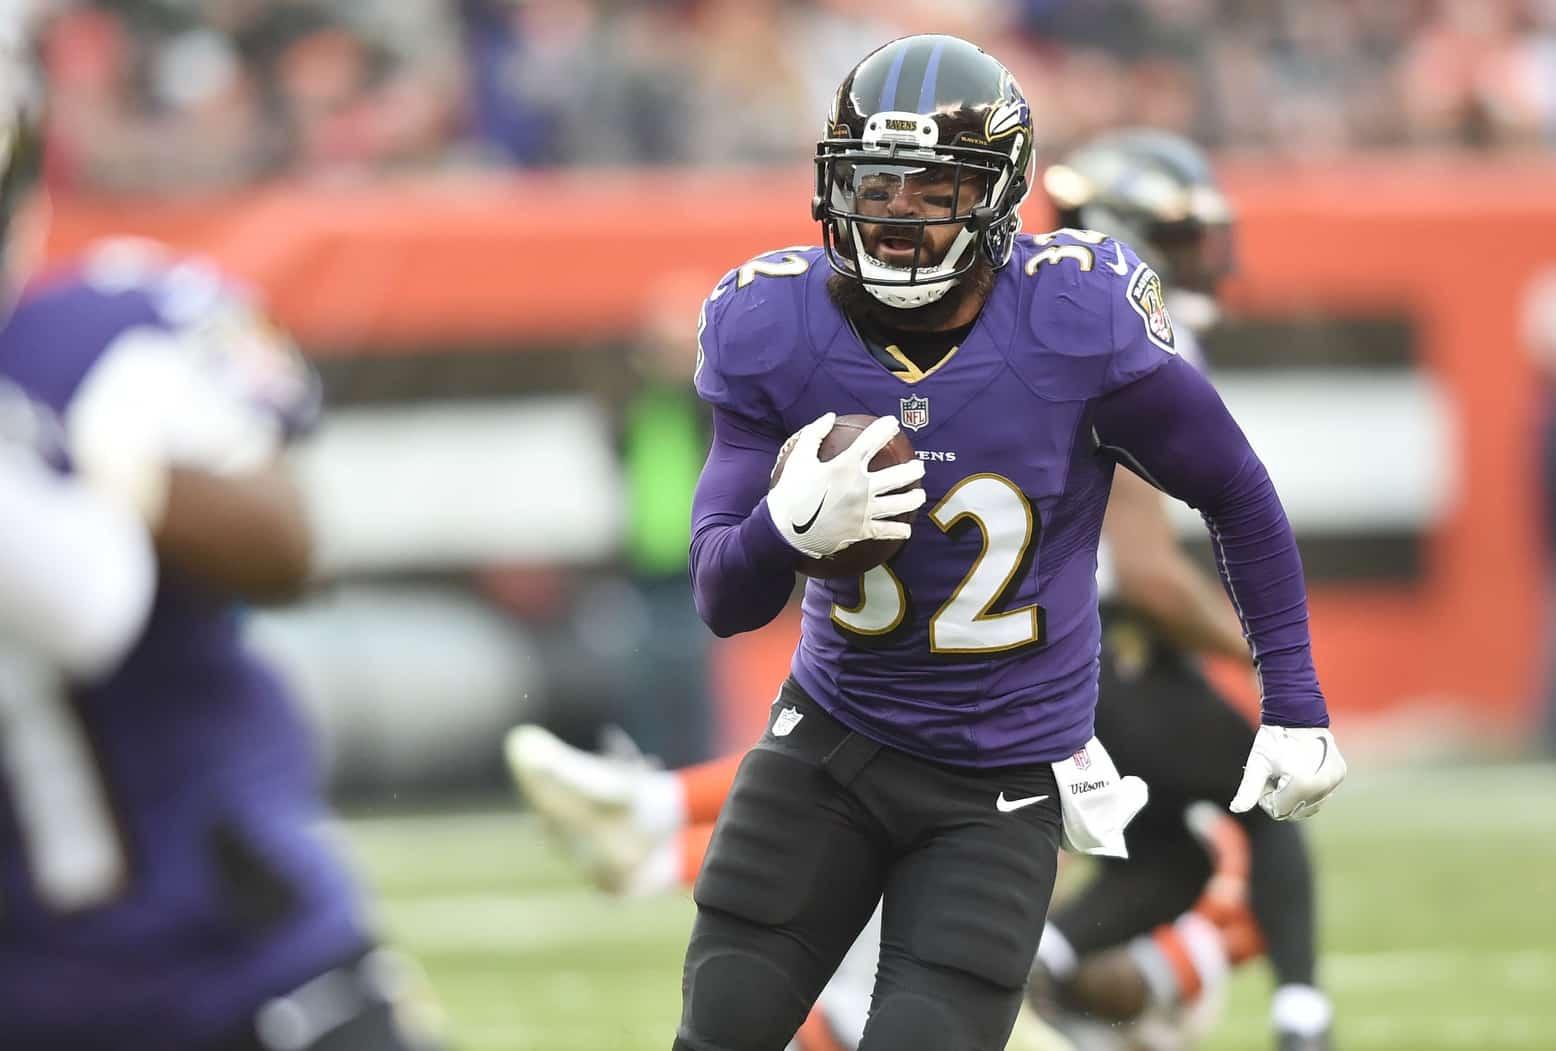 Ravens safety Eric Weddle intercepts a pass